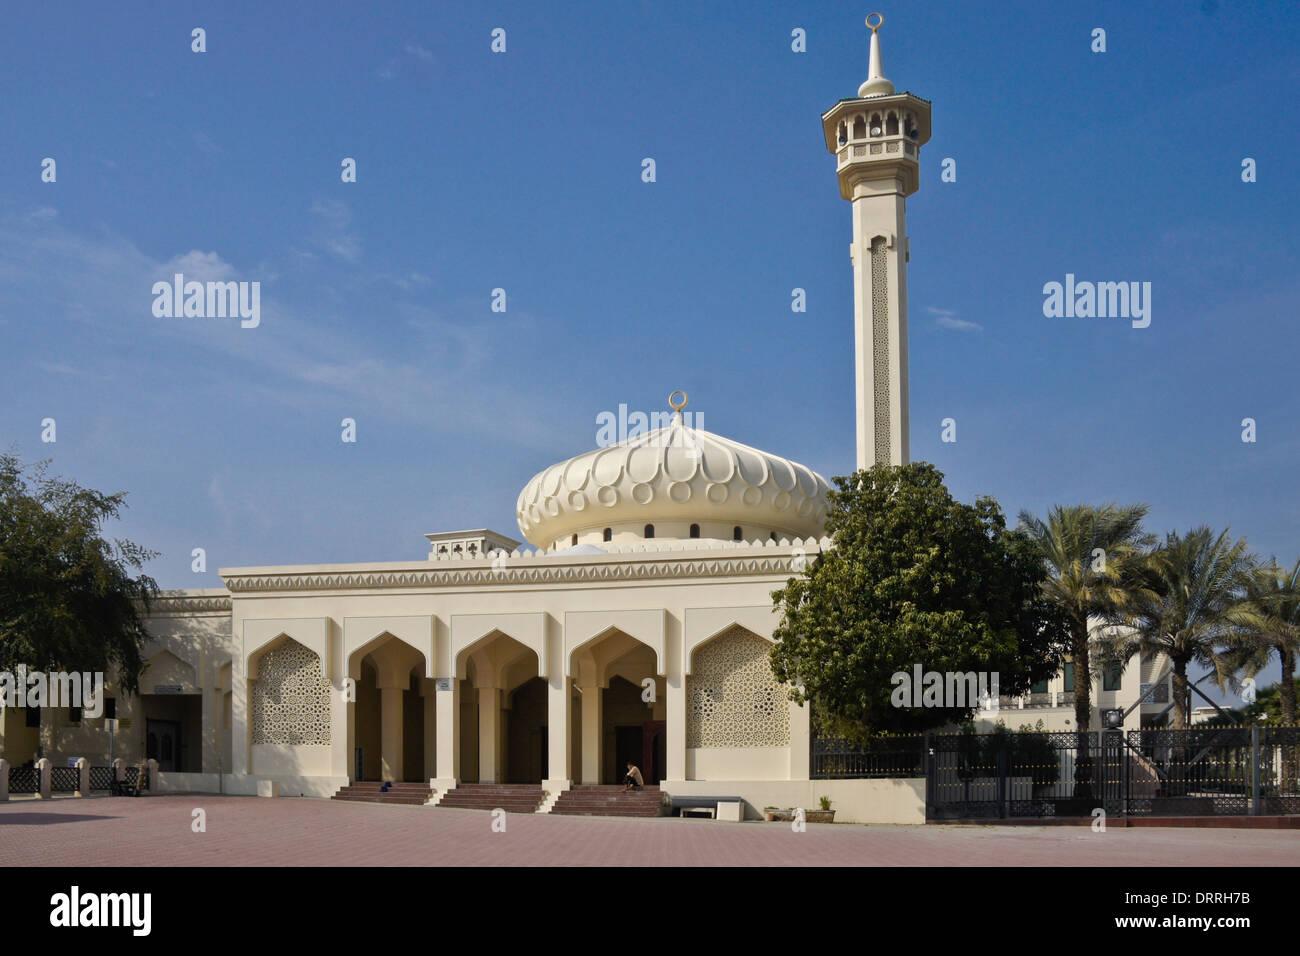 Mosque in Bastakia Quarter of Old Dubai, United Arab Emirates Stock Photo